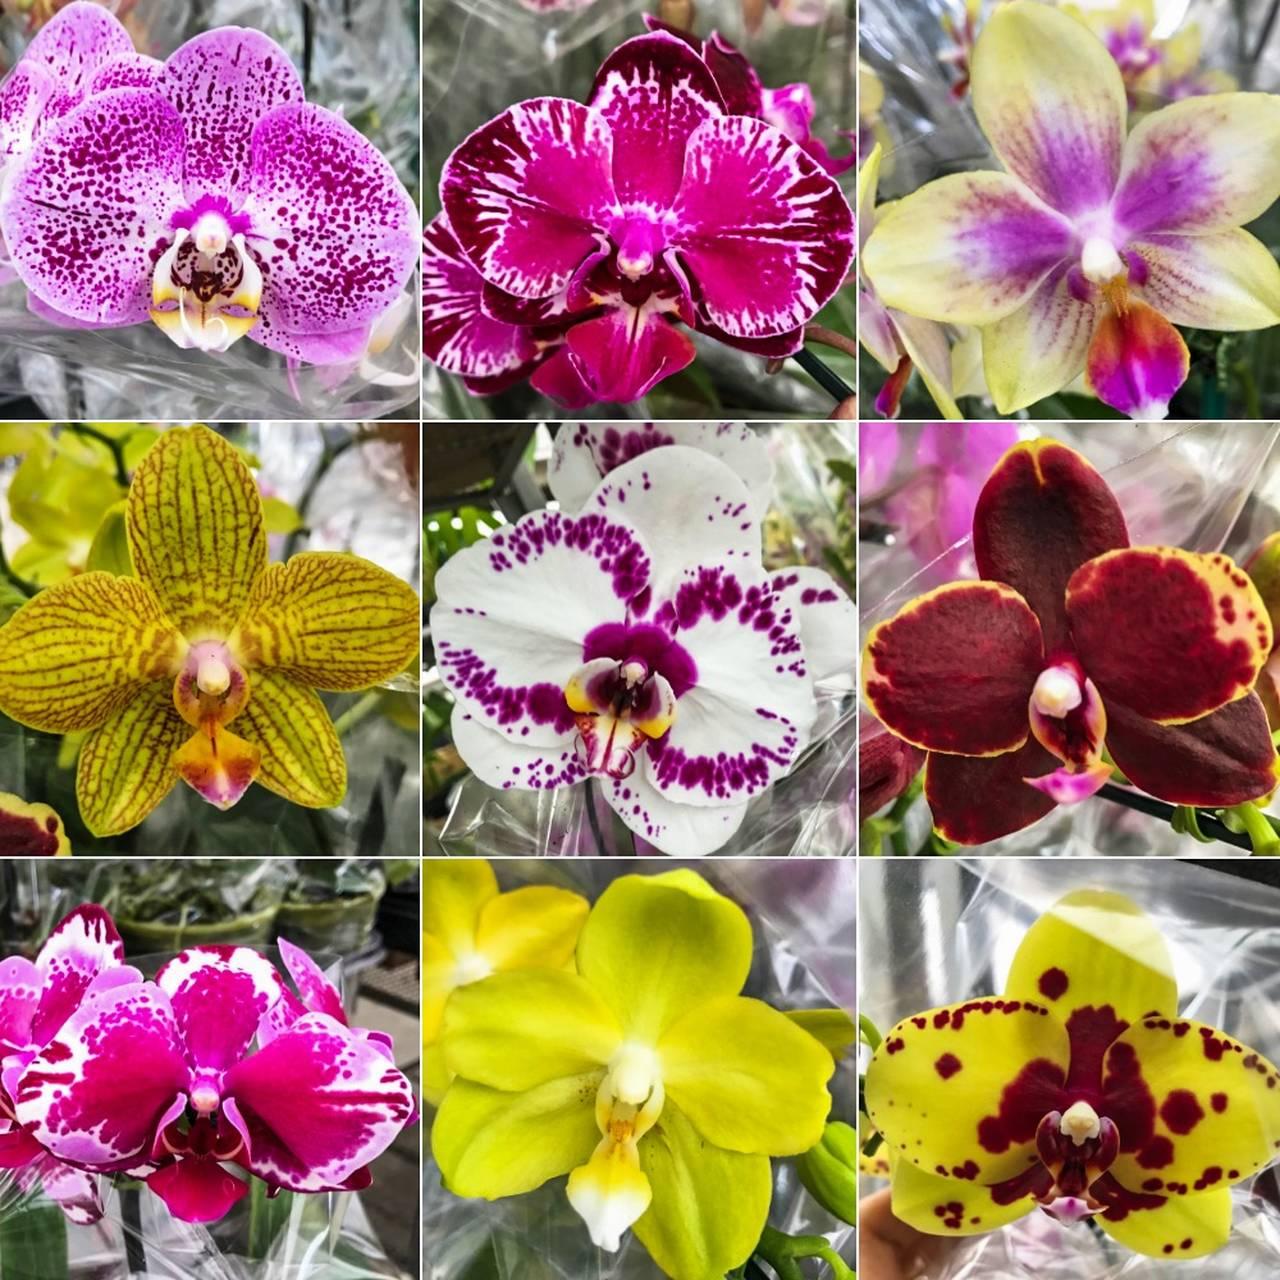 kit 5 mudas de Orquídea Phalaenopsis  - ORQUIDEA GARDEN